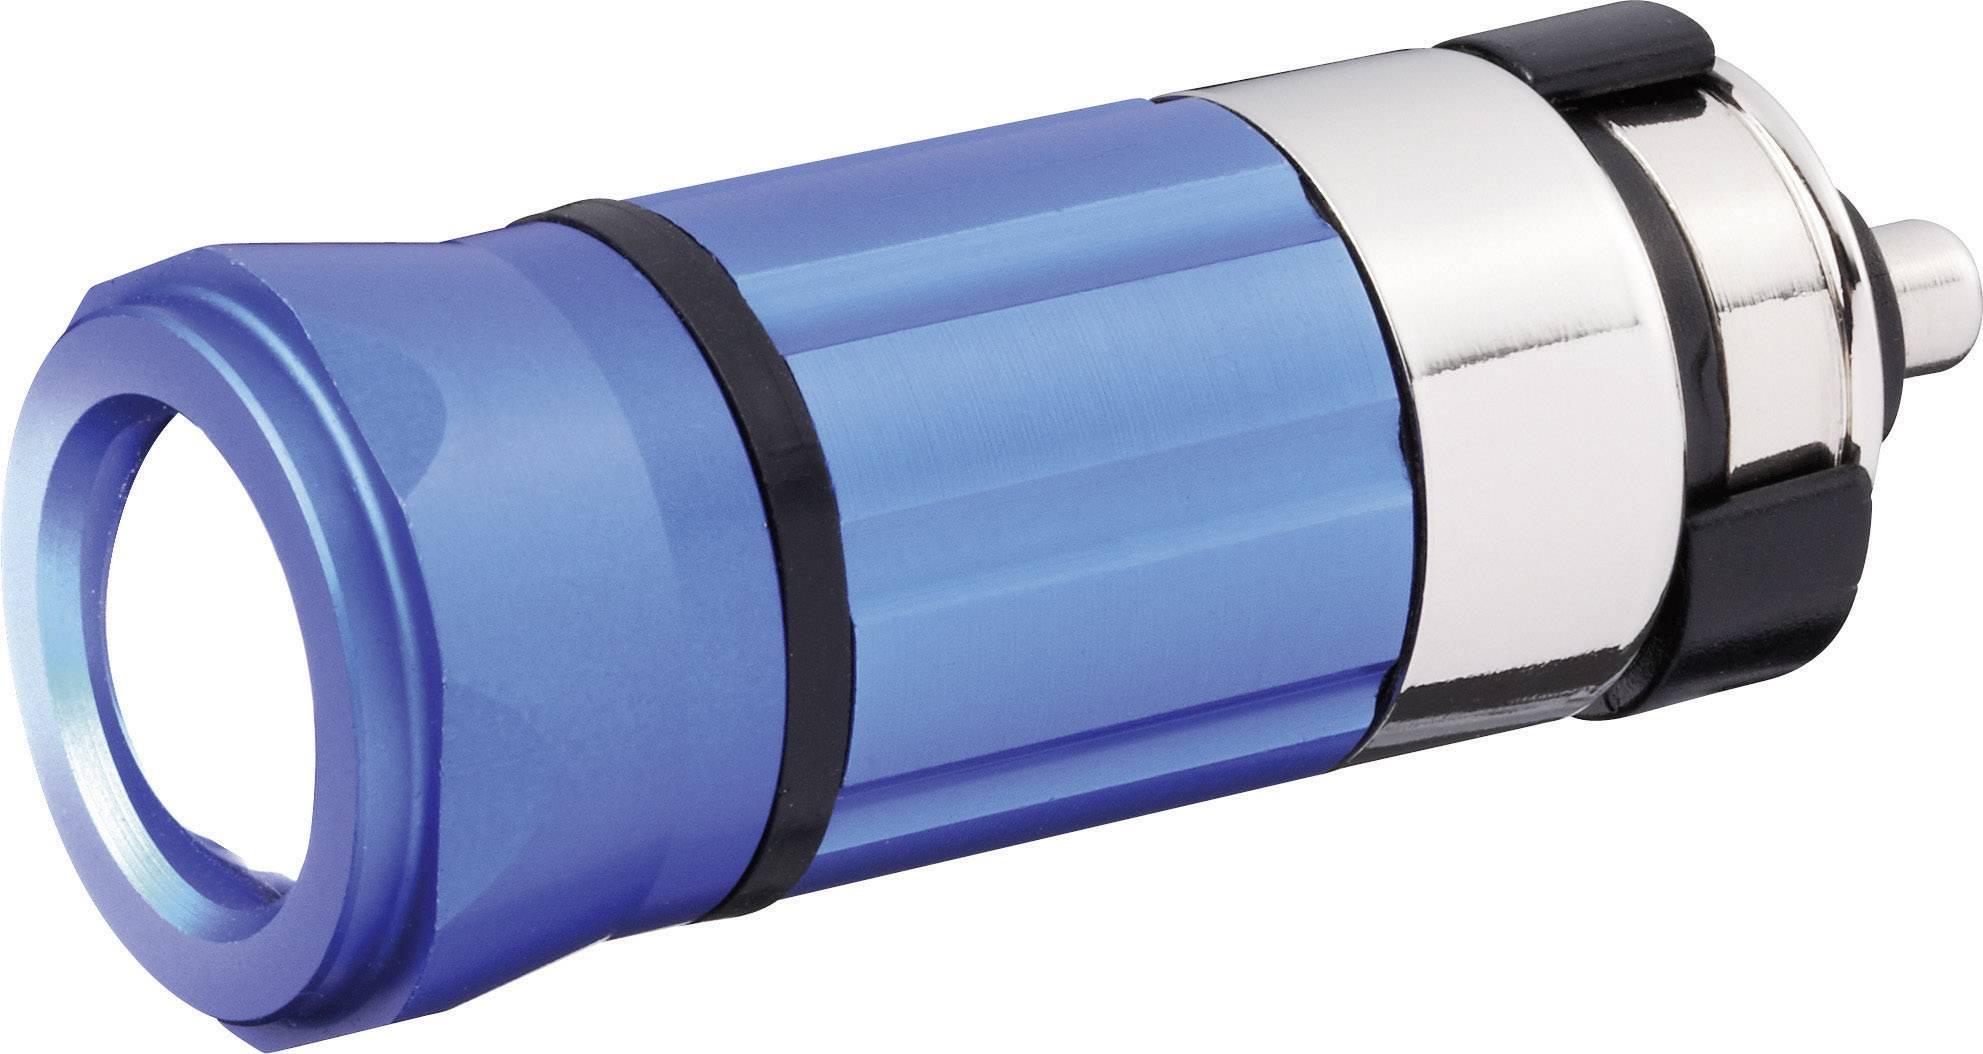 lamp voor sigarettenaansteker 12 v led x l 23 mm x 55 mm accuwerking al9507b al9507b